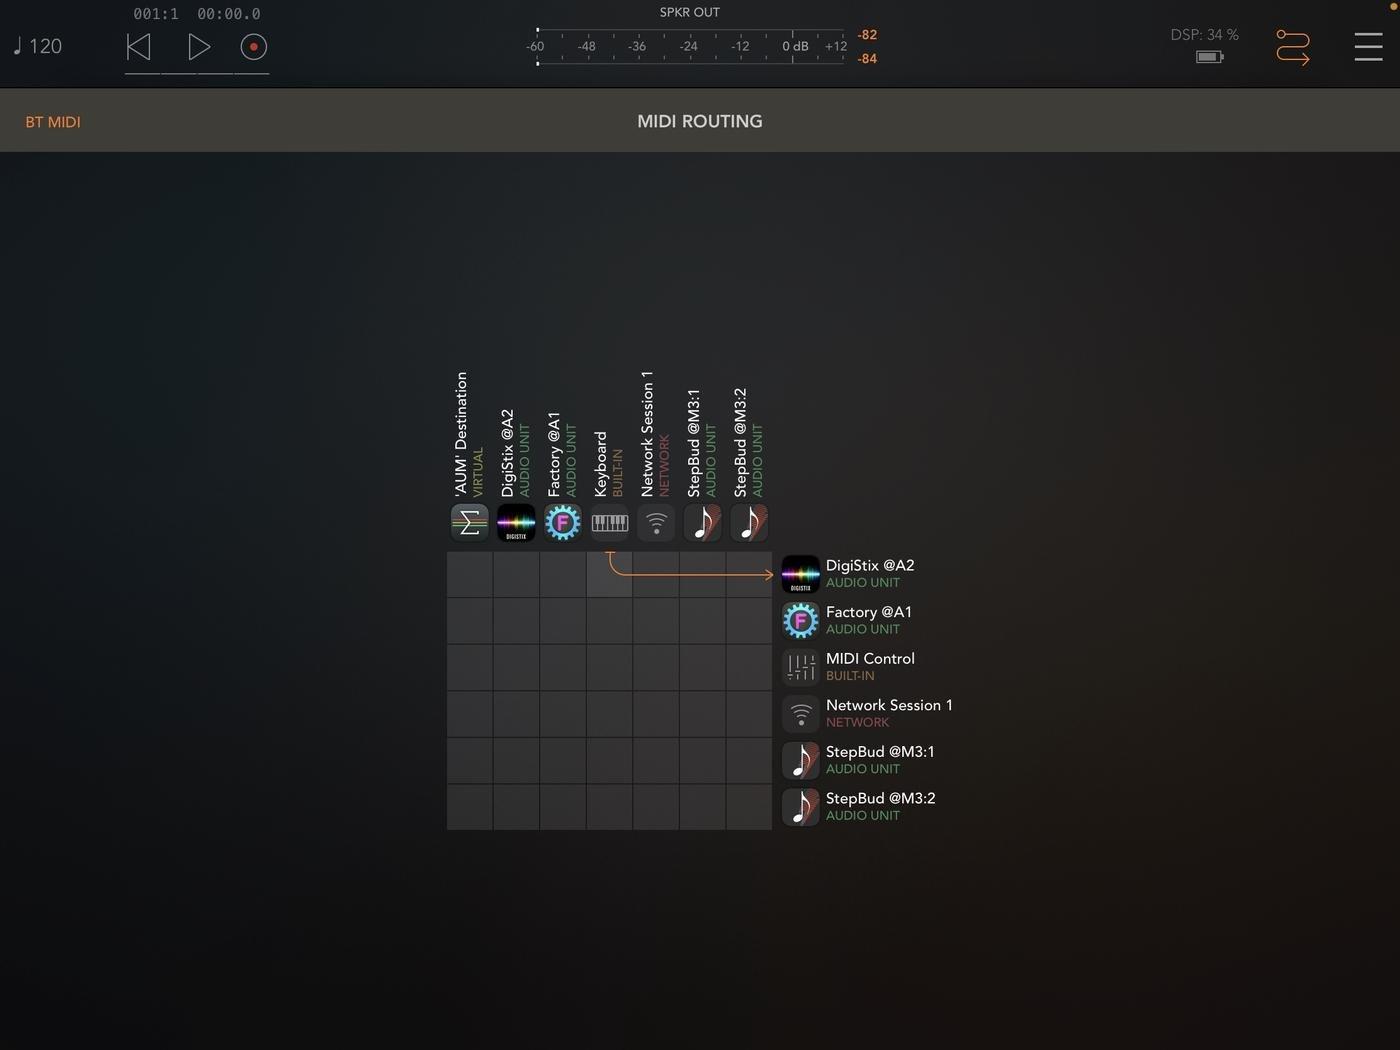 MIDI Connection Matrix